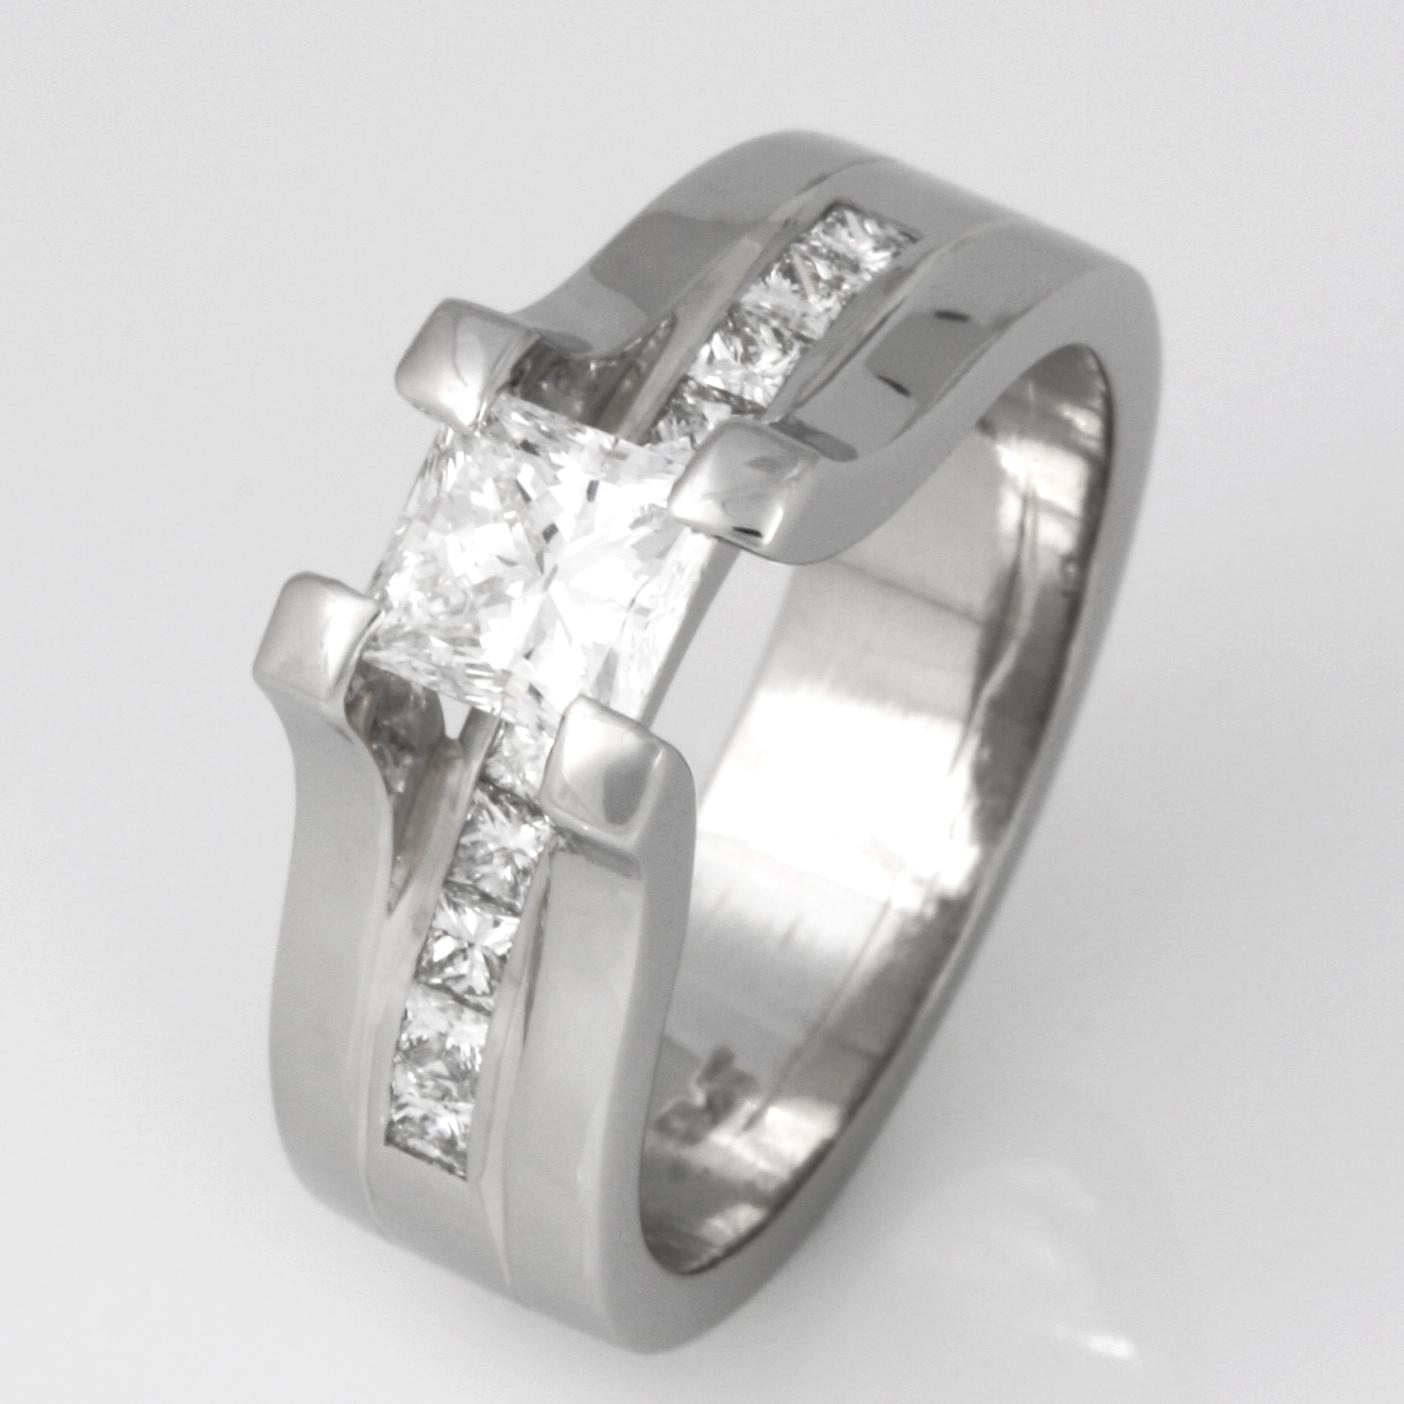 Handmade ladies platinum princess cut diamond engagement ring